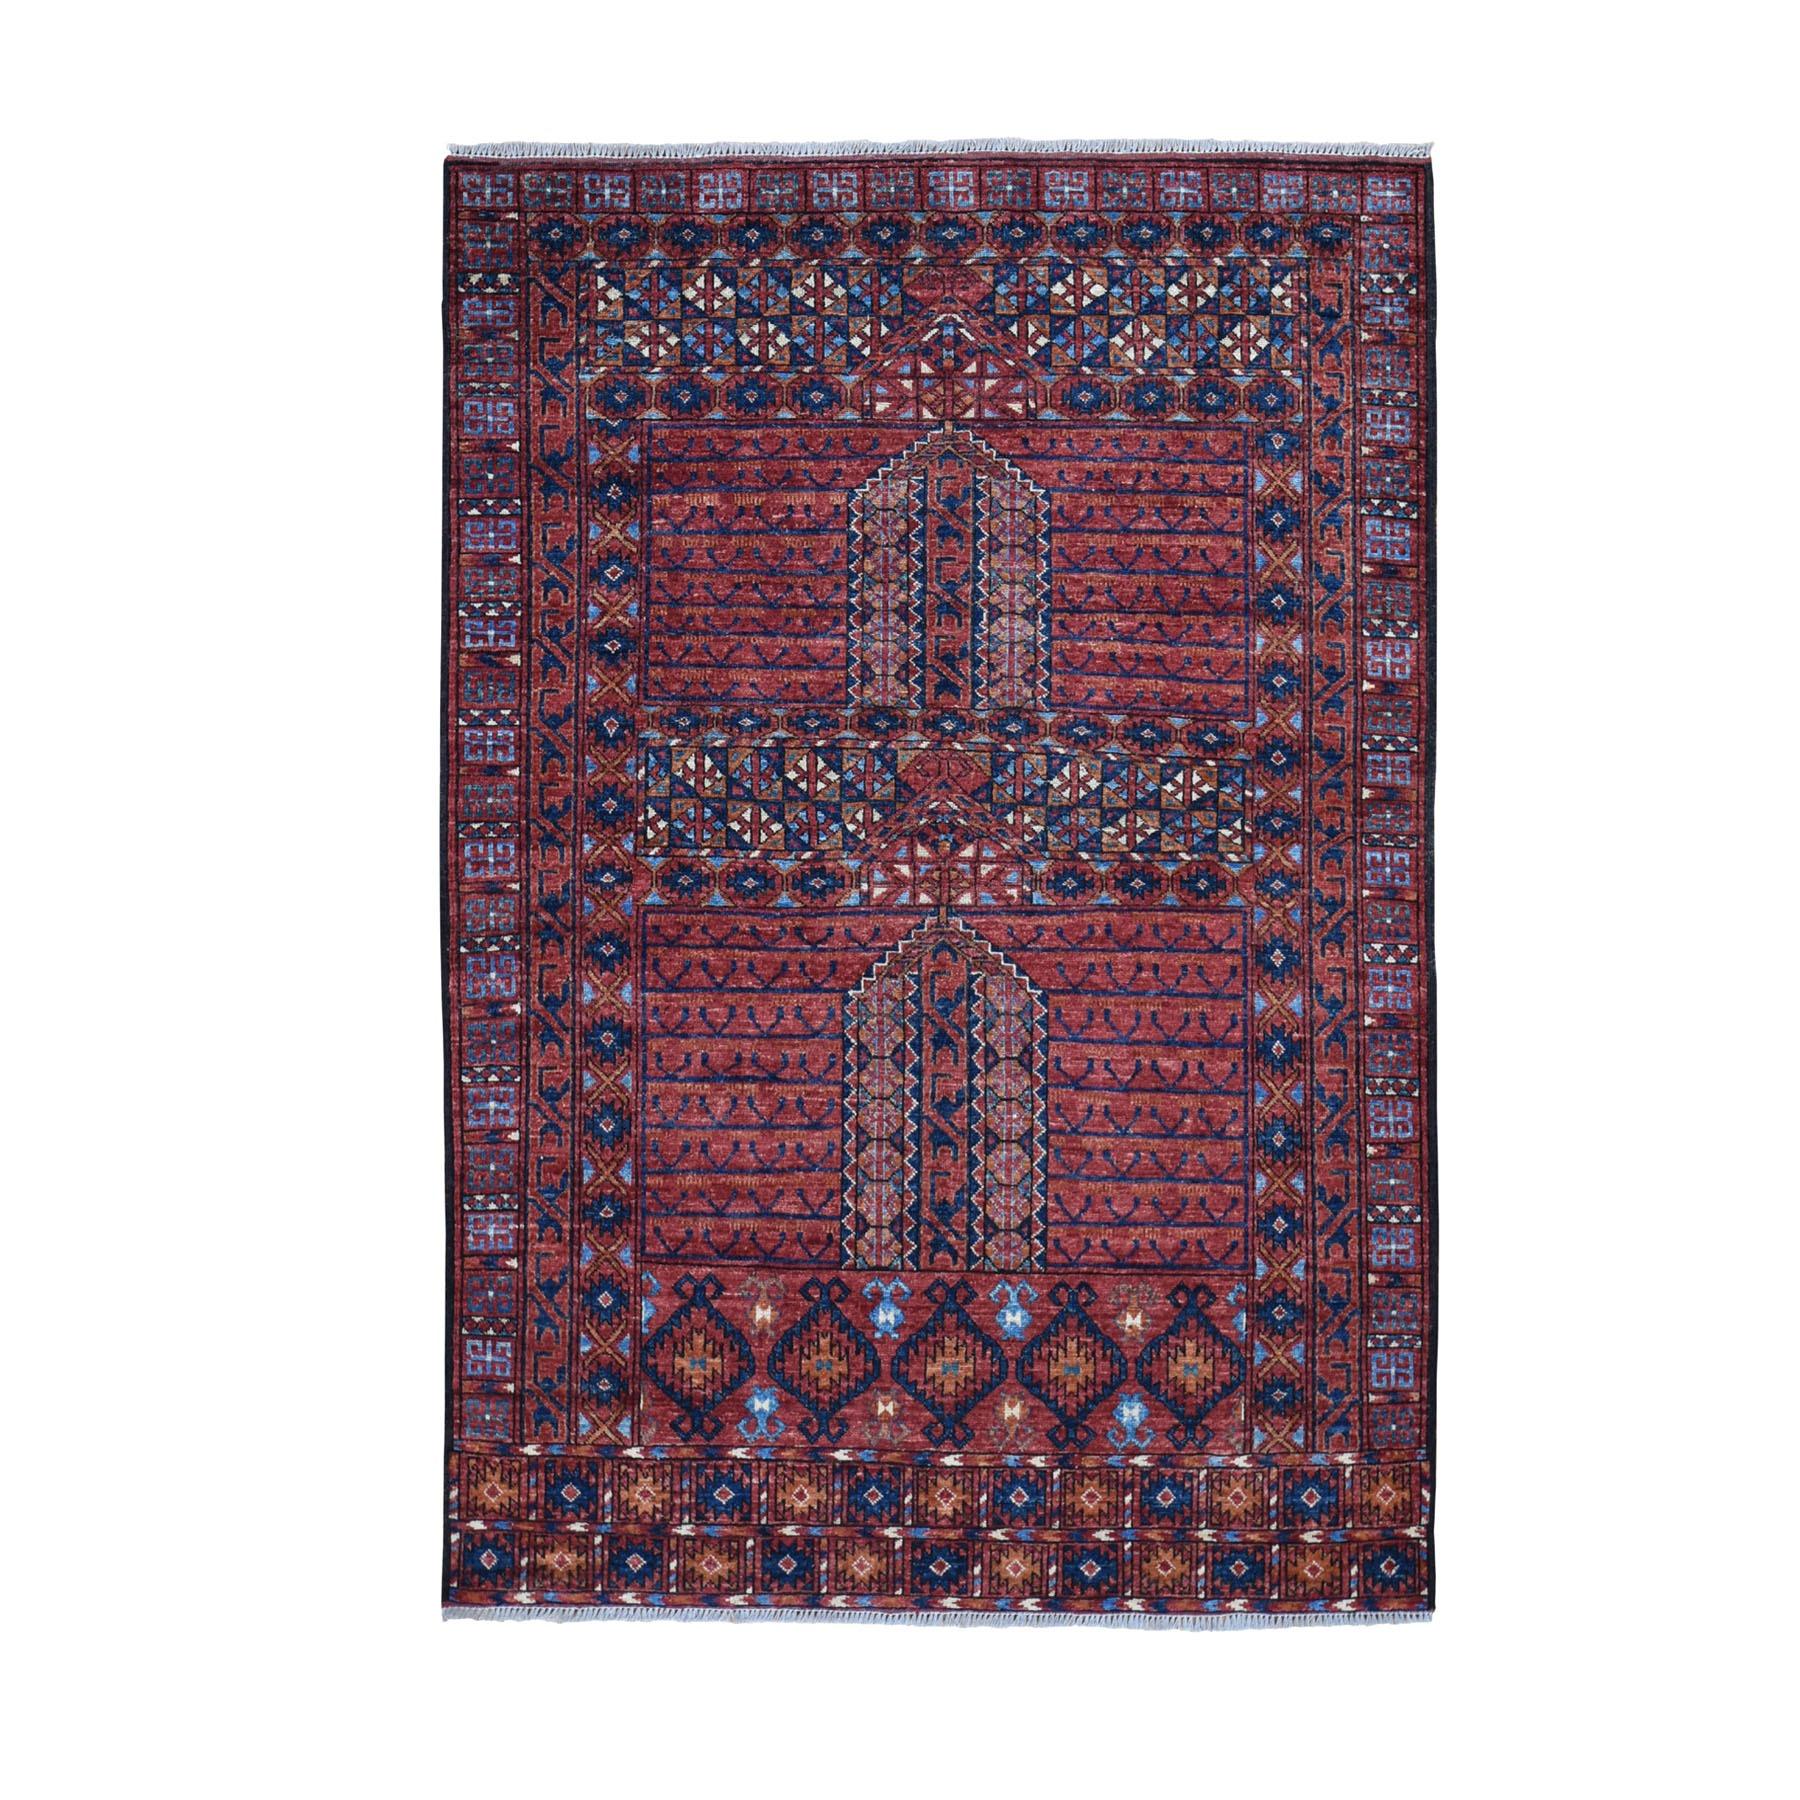 "4'9""x6'4"" Afghan Ersari Hutchlu Design Pure Wool Hand Knotted Oriental Rug"